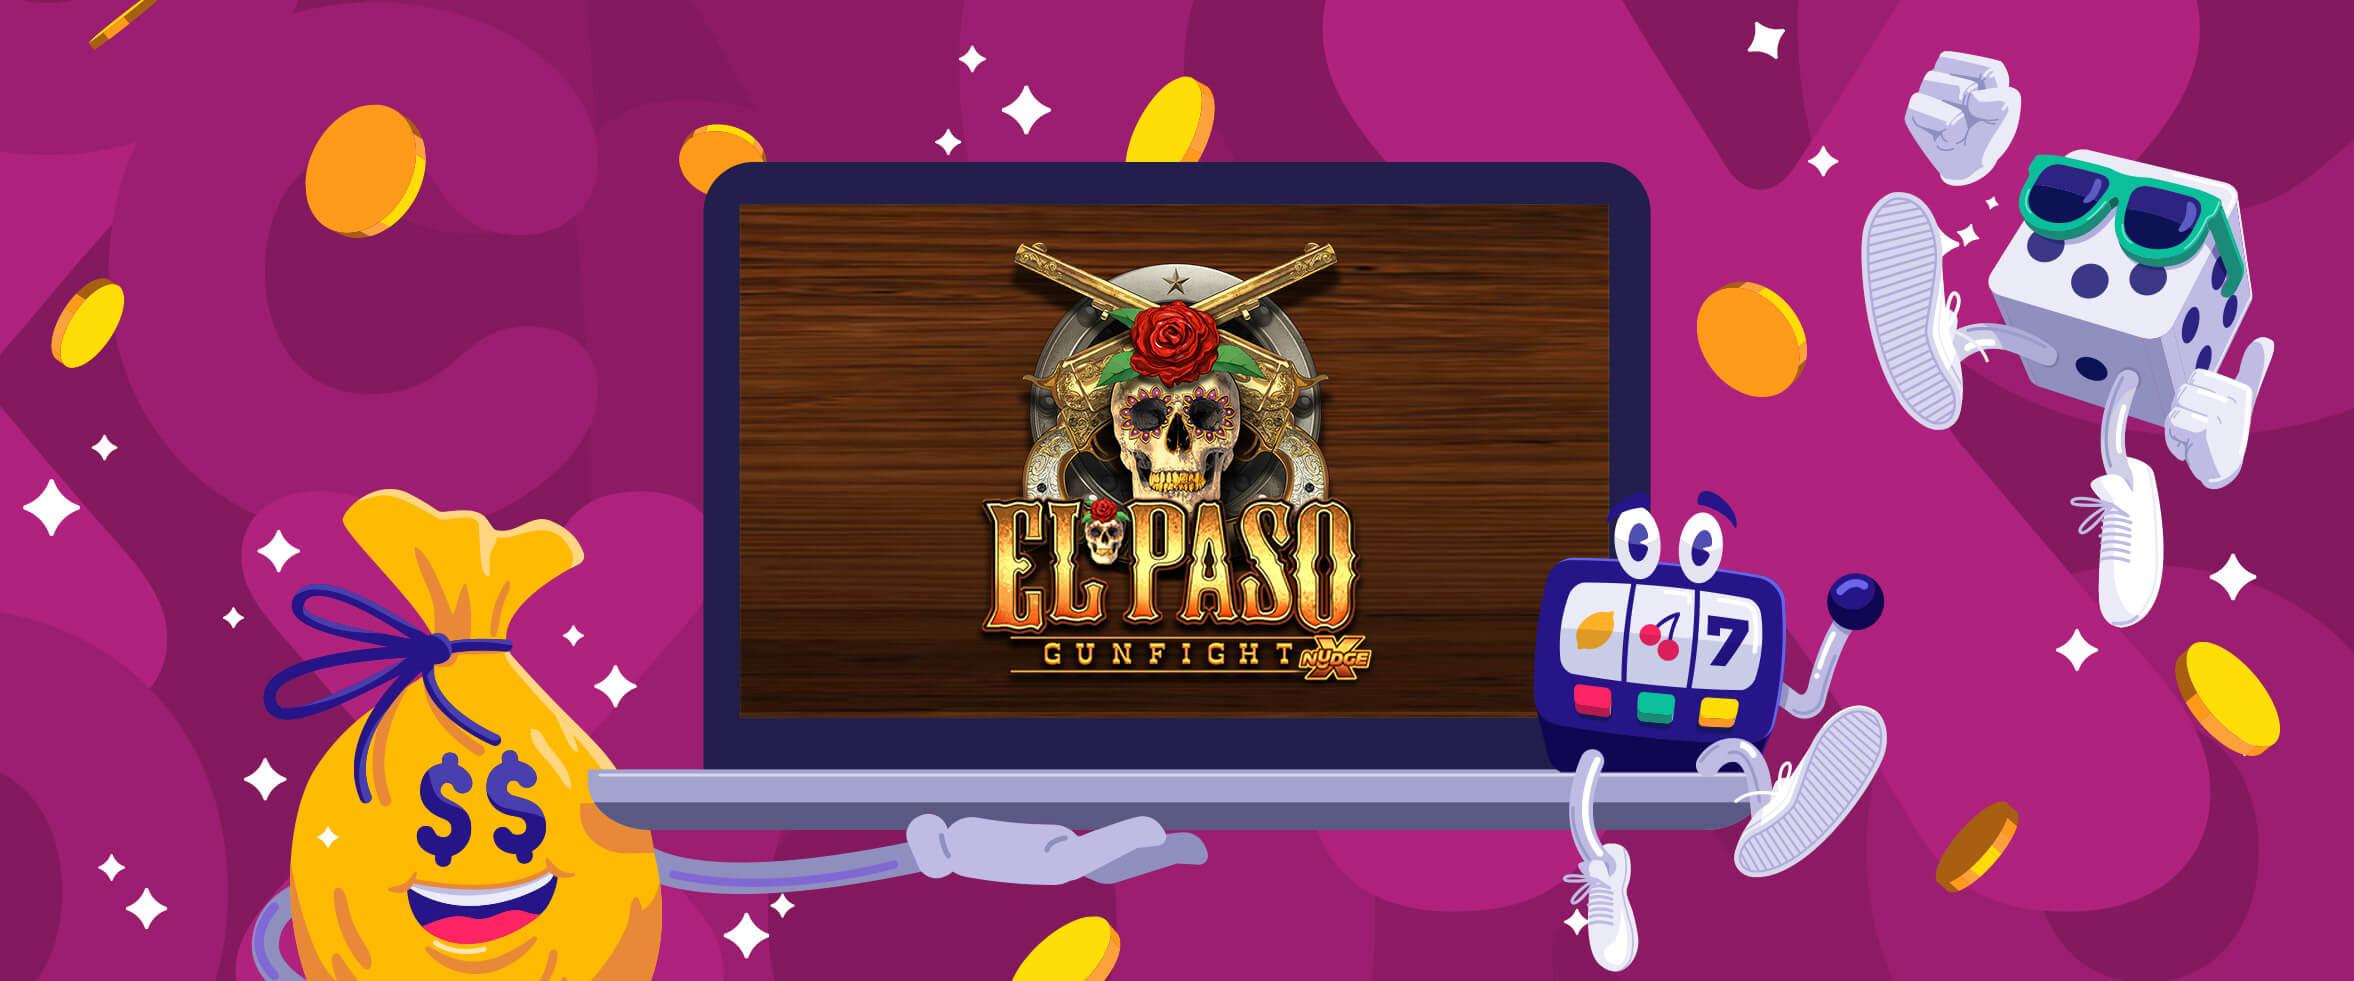 🤠 El Paso Gunfight: 10.000€ Preispool + 700 Freispiele